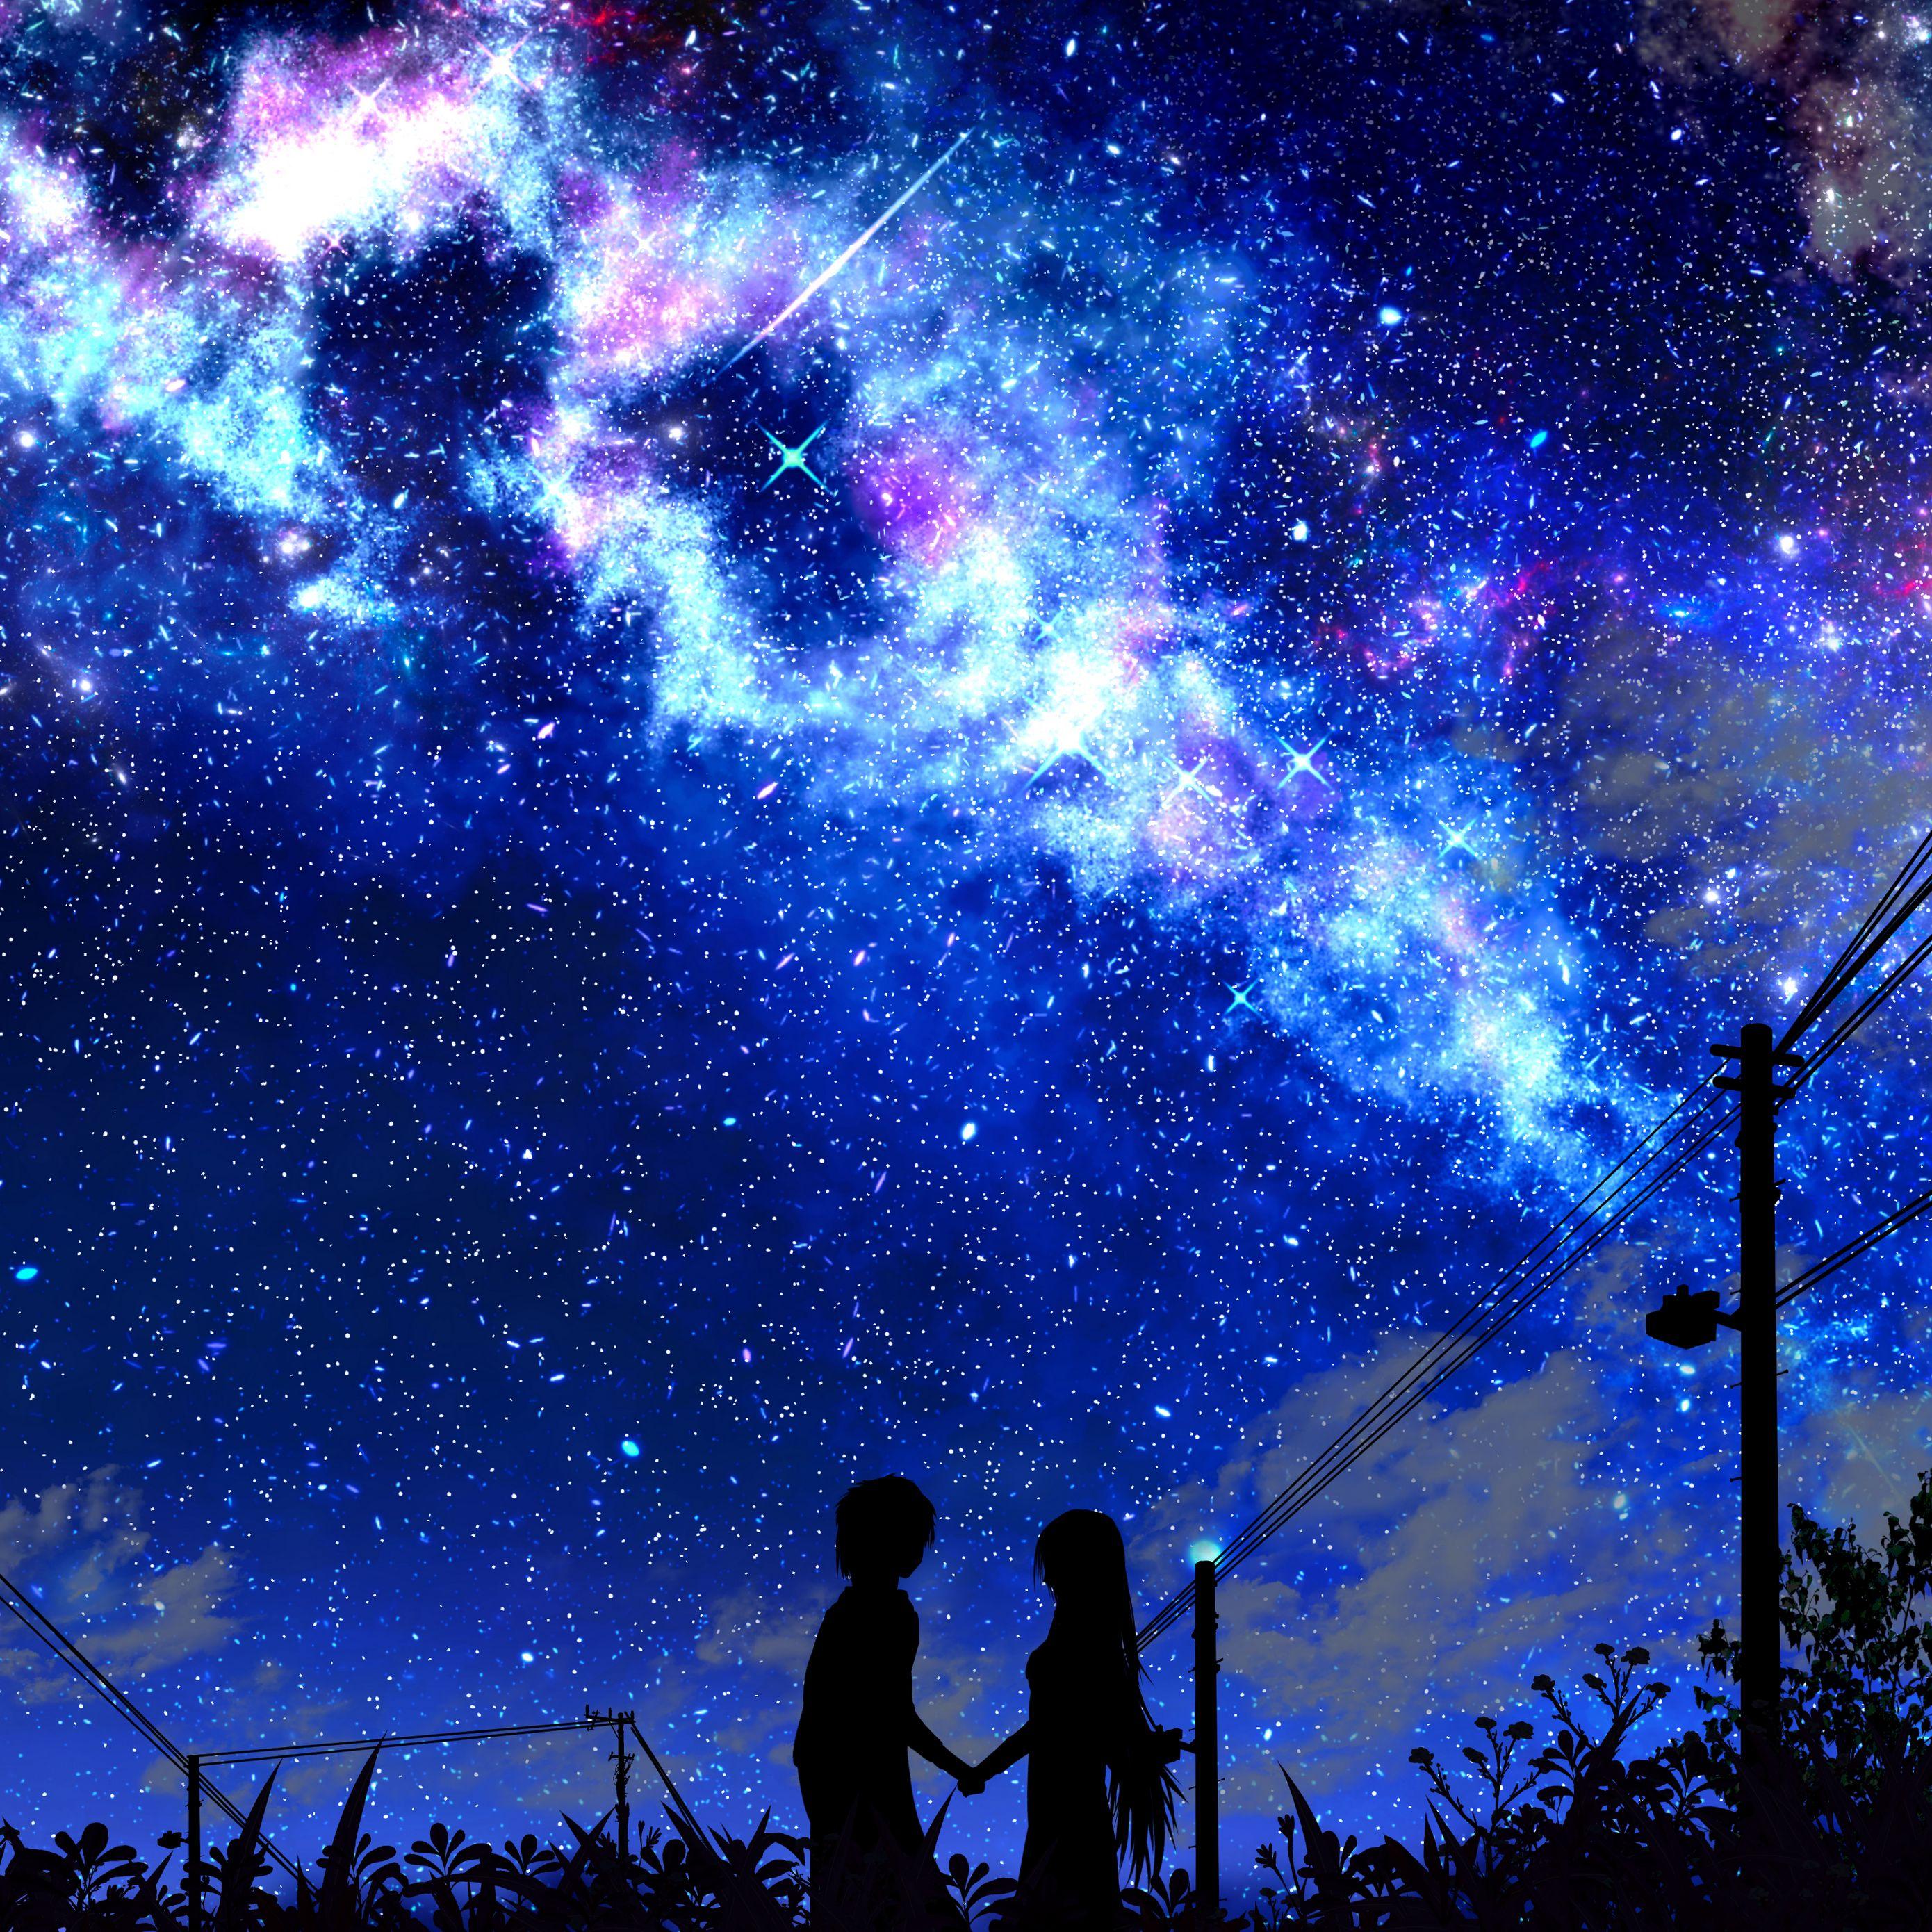 2780x2780 Wallpaper silhouette, night, starry sky, art, dark